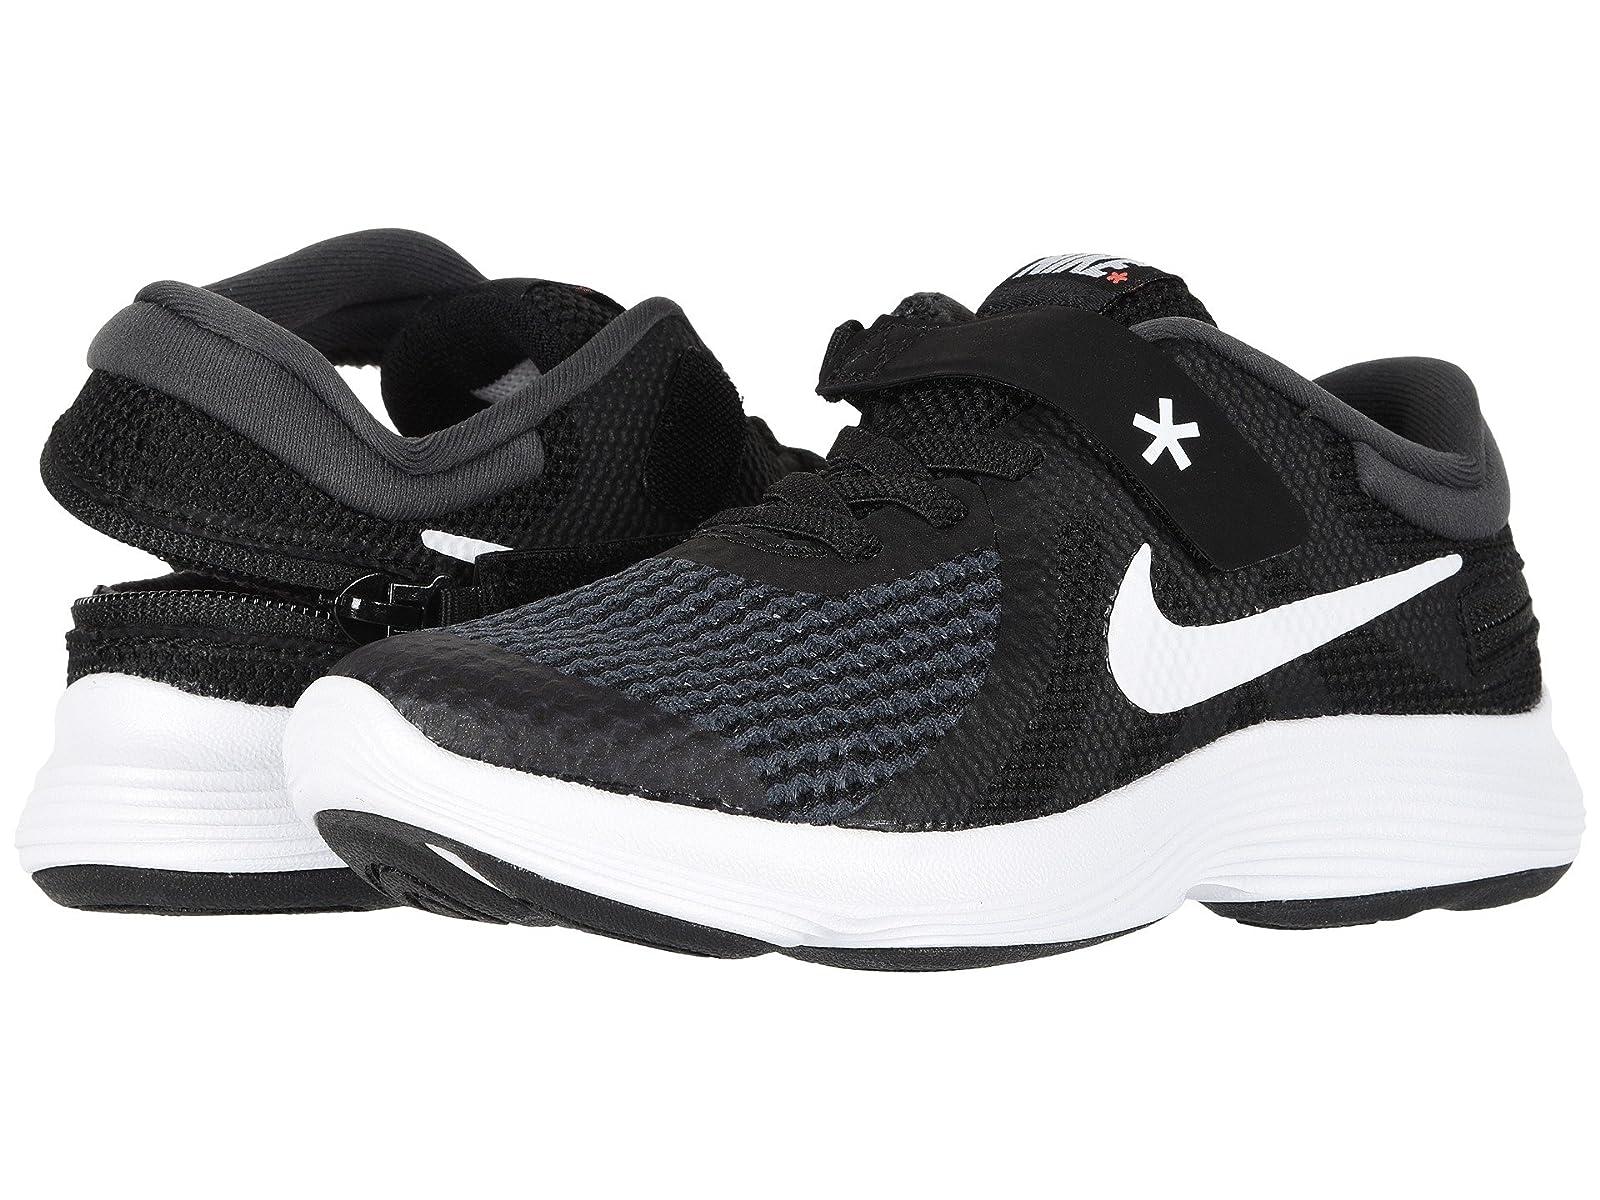 Nike Kids Revolution 4 FlyEase (Little Kid)Atmospheric grades have affordable shoes